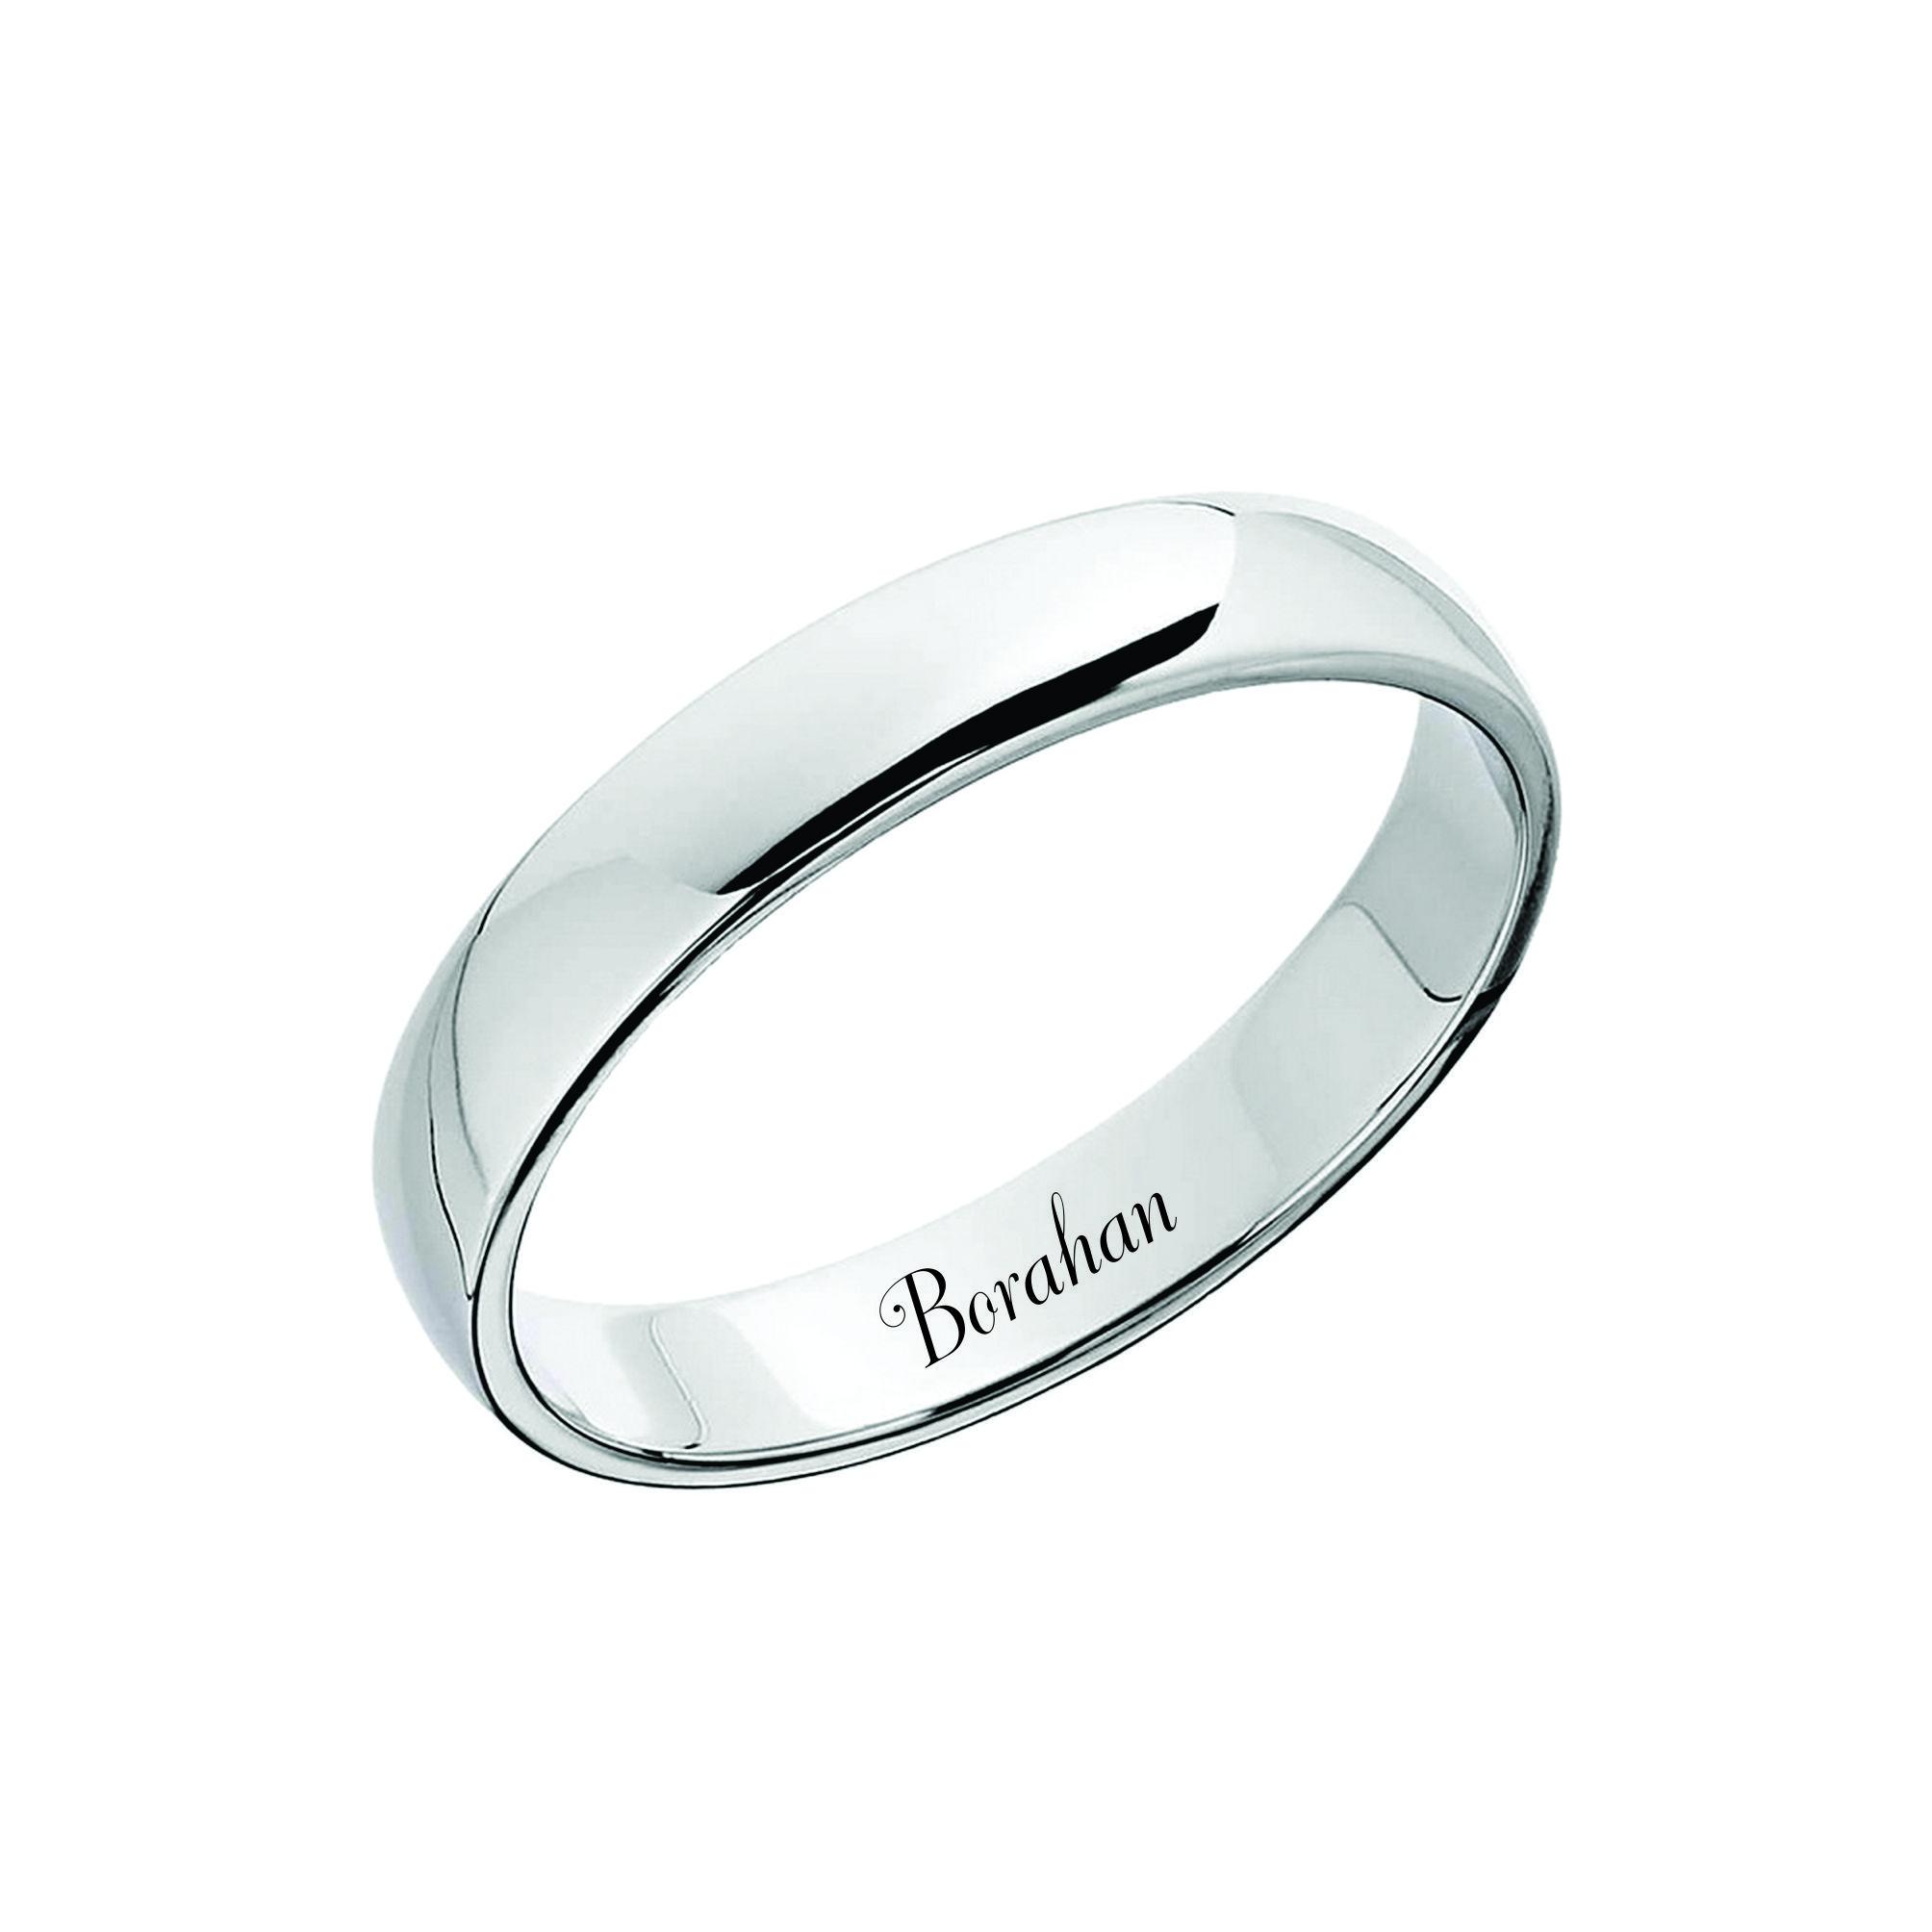 انگشتر ترمه ۱ مدل borhan